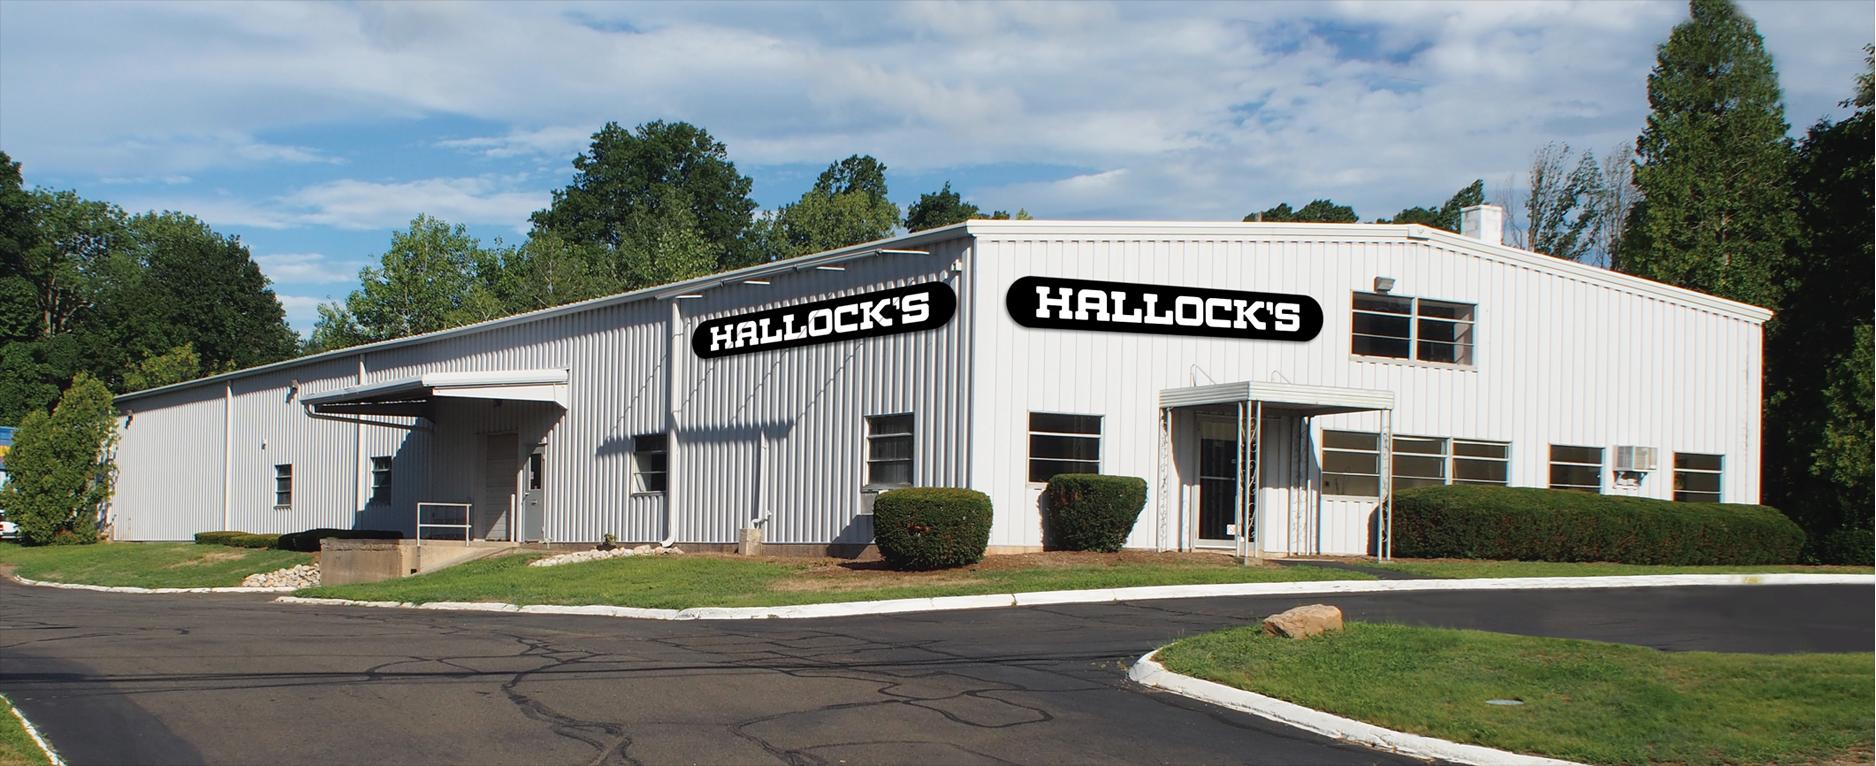 HALLOCK'S image 0